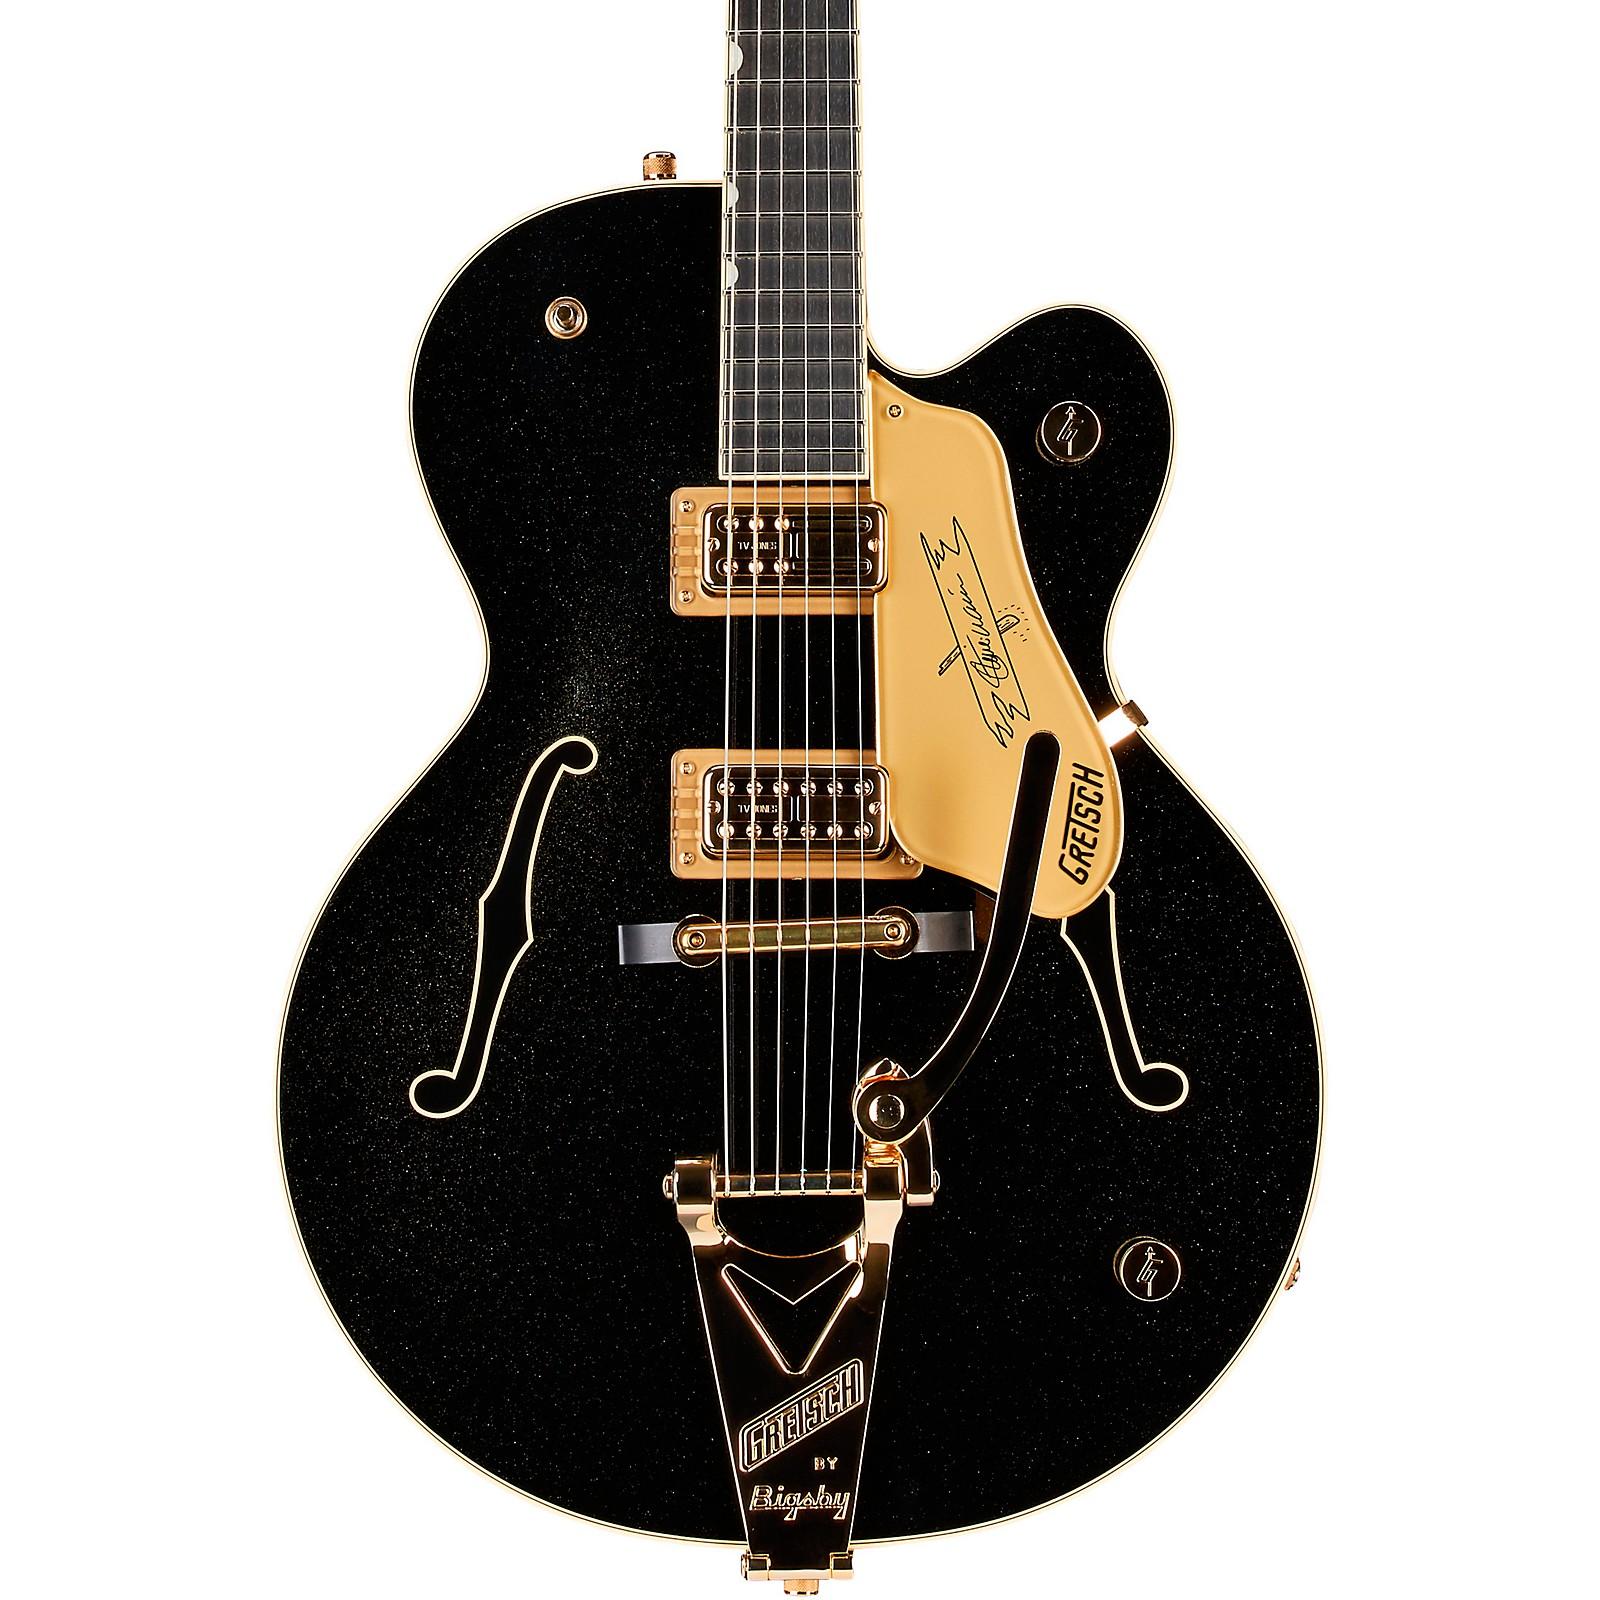 Gretsch Guitars G6120T-SW Steve Wariner Signature Nashville Gentleman with Bigsby Electric Guitar